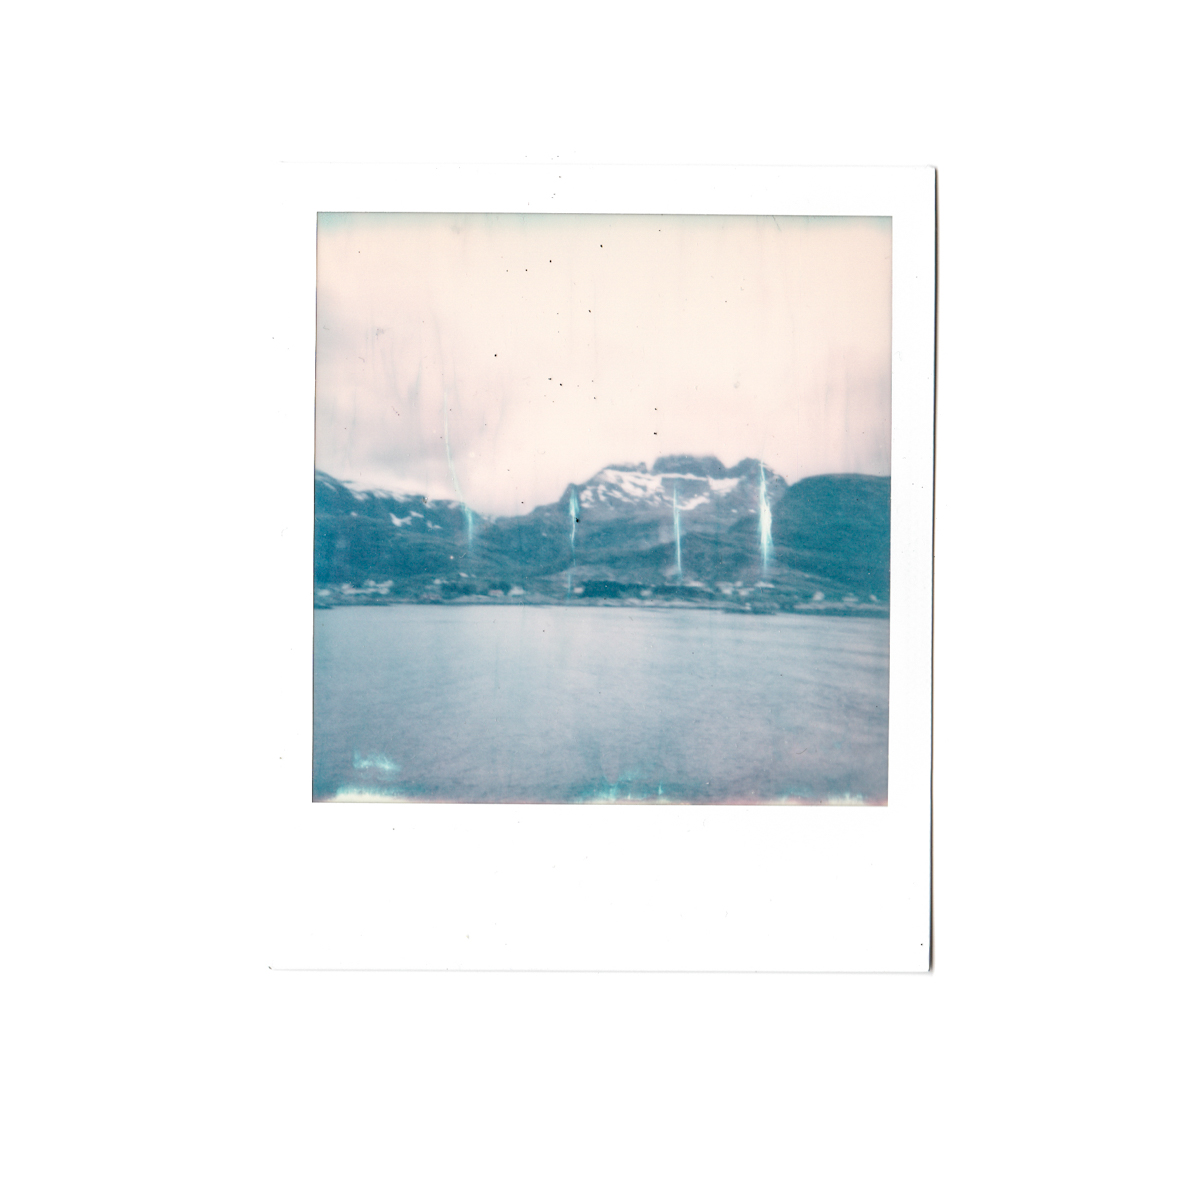 Magnolia_mountain_solvor_MT34-16.jpg